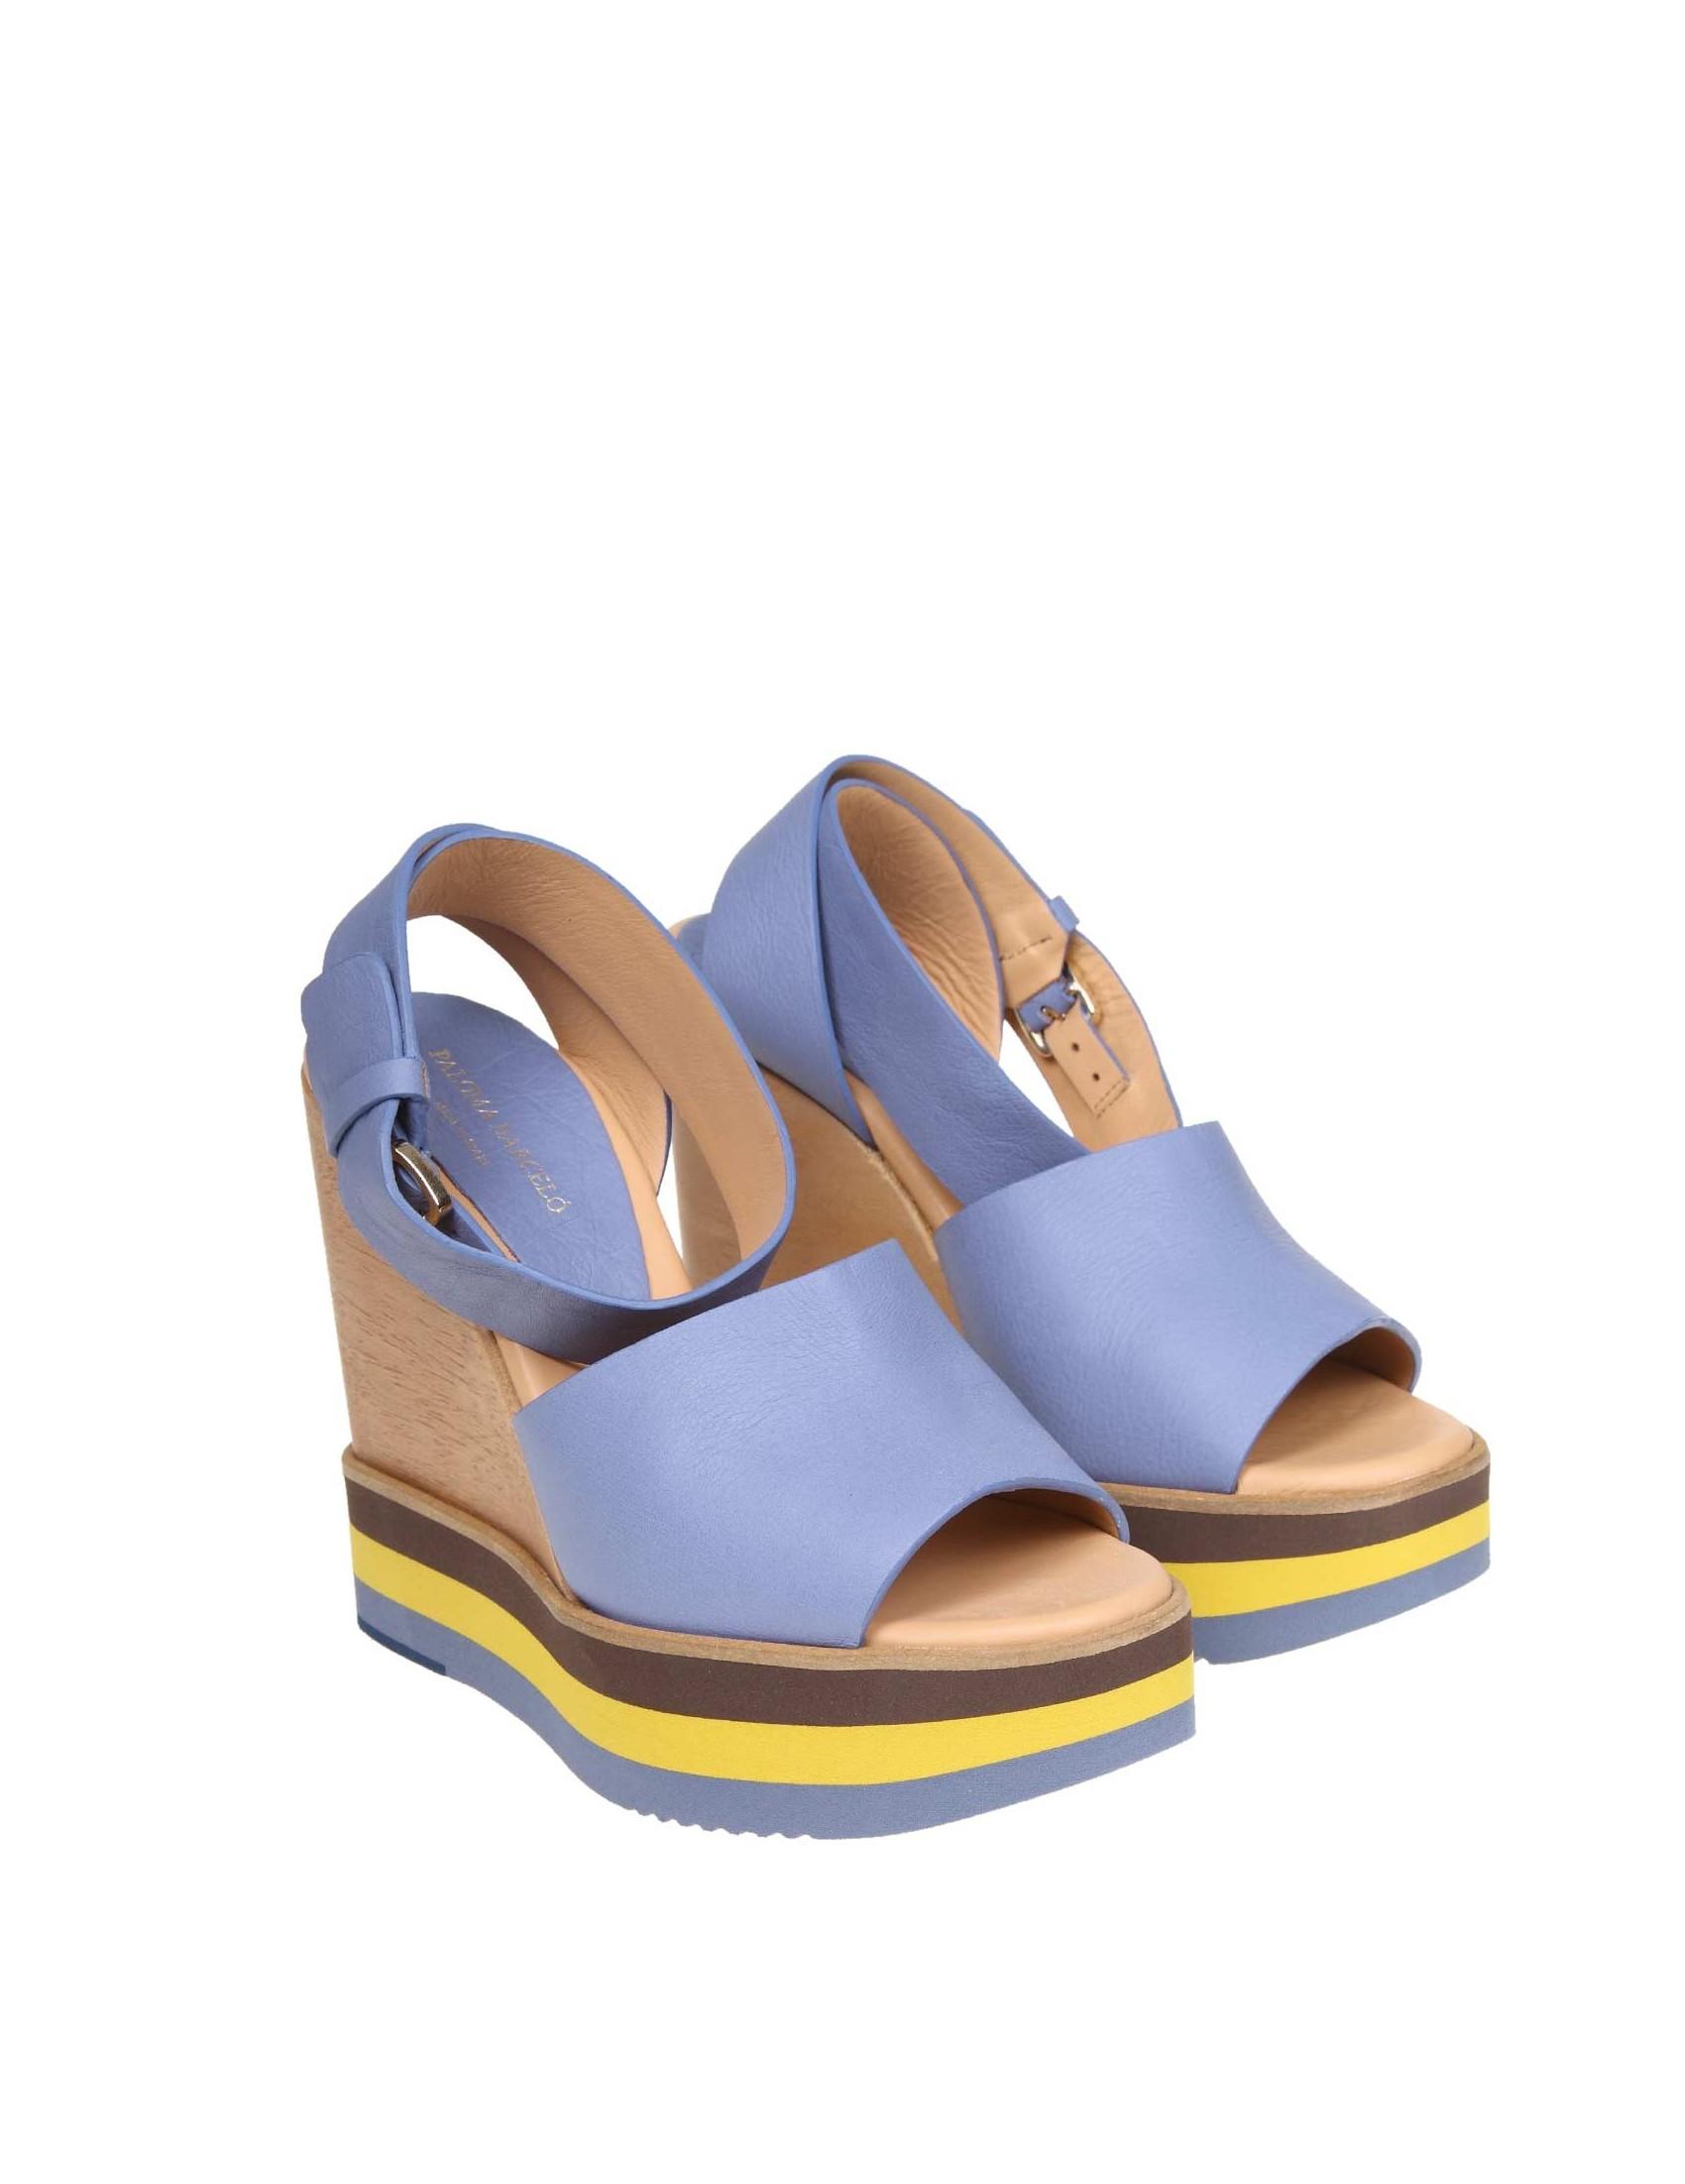 Azzurro Ipkuozx In Colore Sandalo Pelle Paloma Ayaka Barcelo nmv8N0w